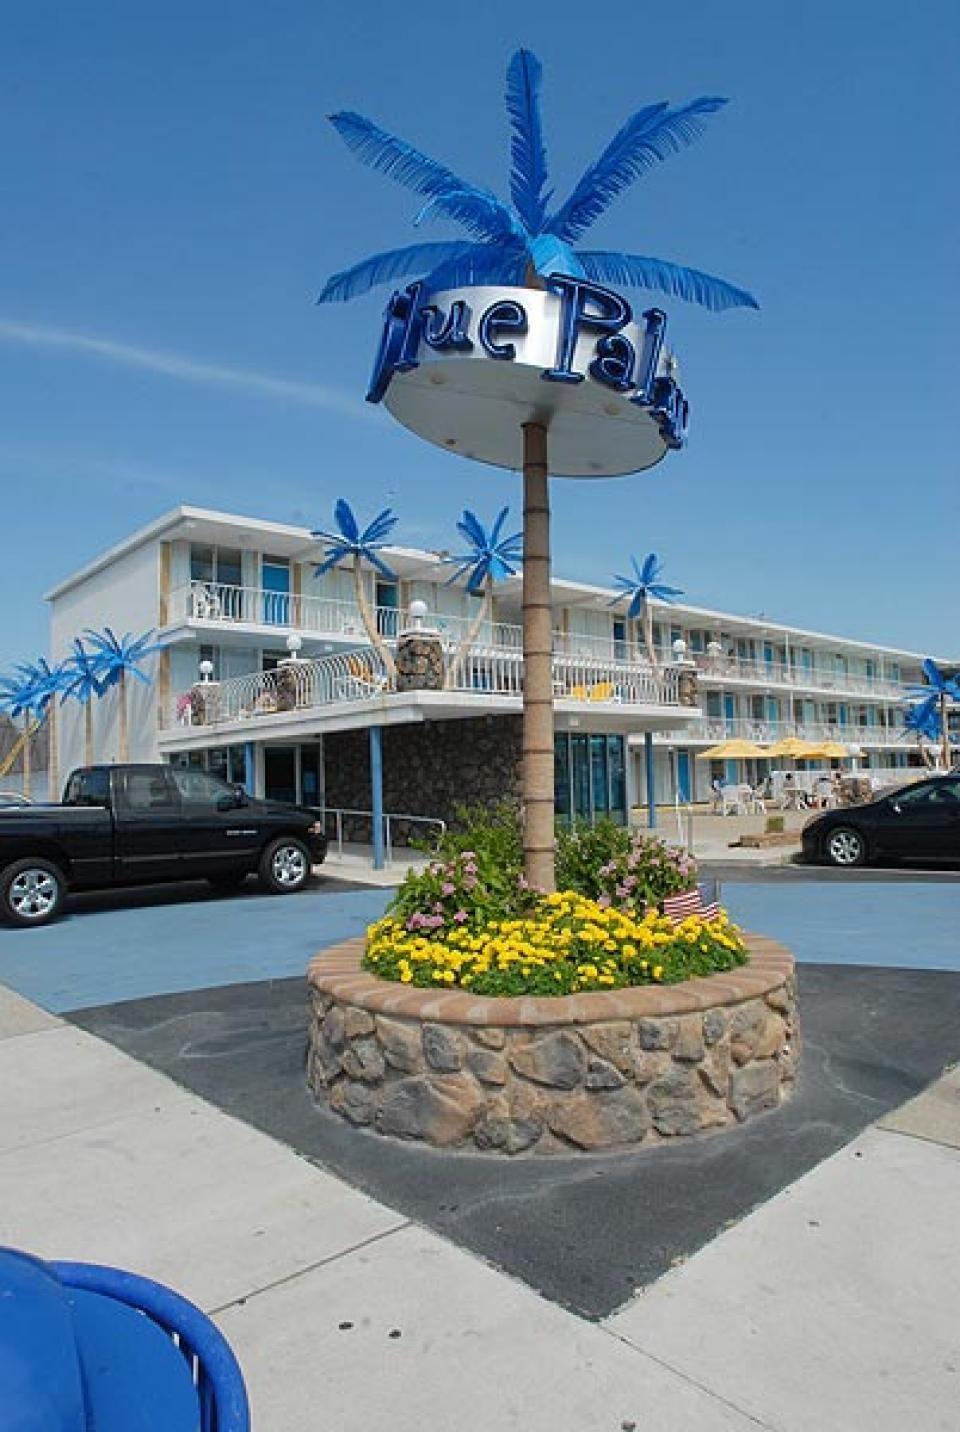 The Blue Palms Motel - Wildwood, NJ